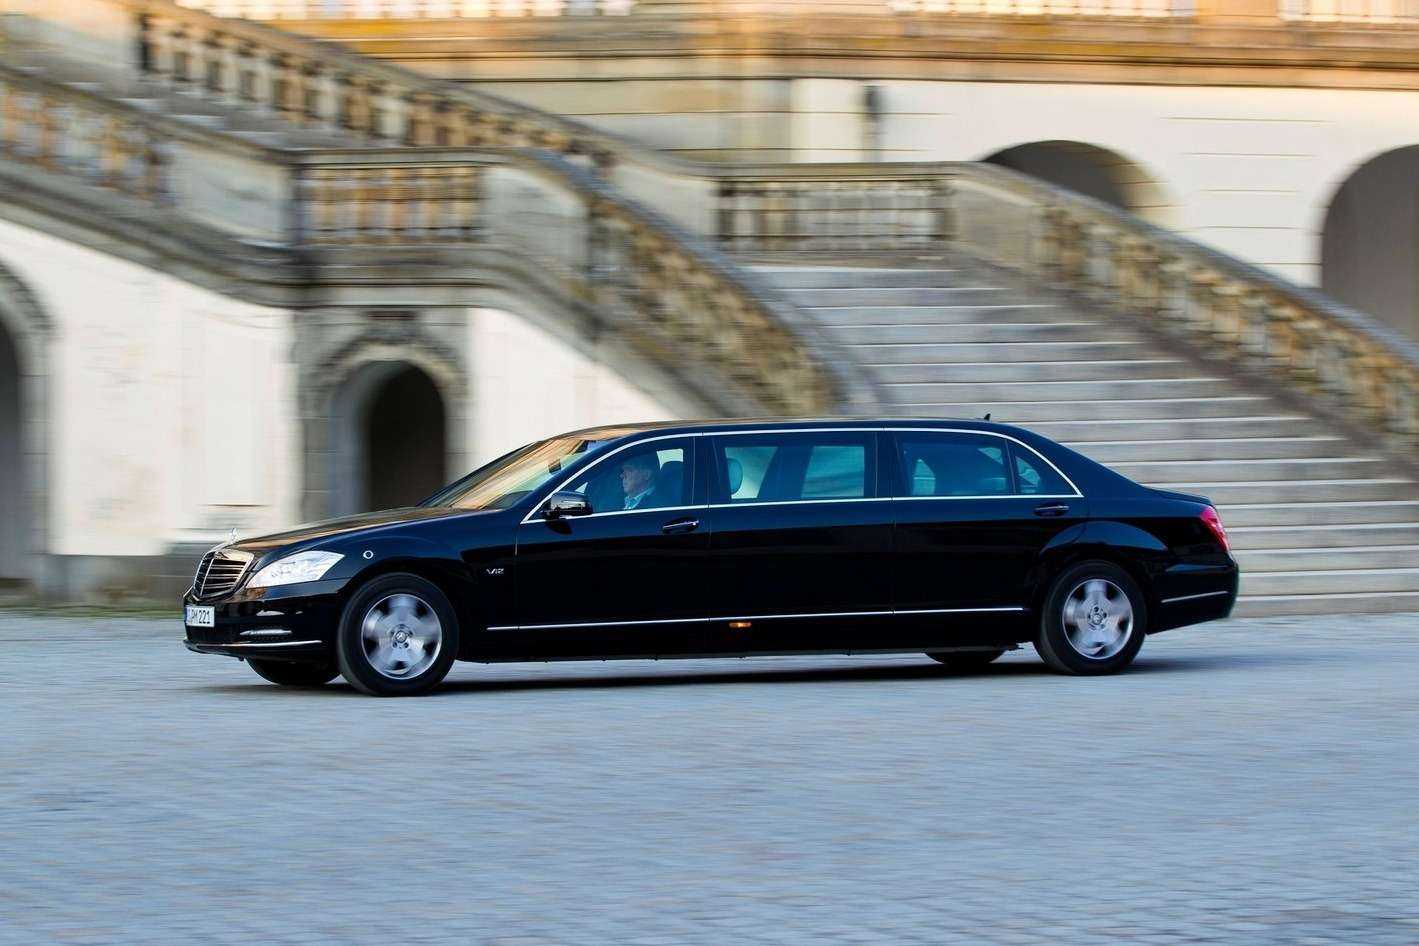 Mercedes-Benz-S600_Pullman_Guard_2011_1600x1200_wallpaper_05